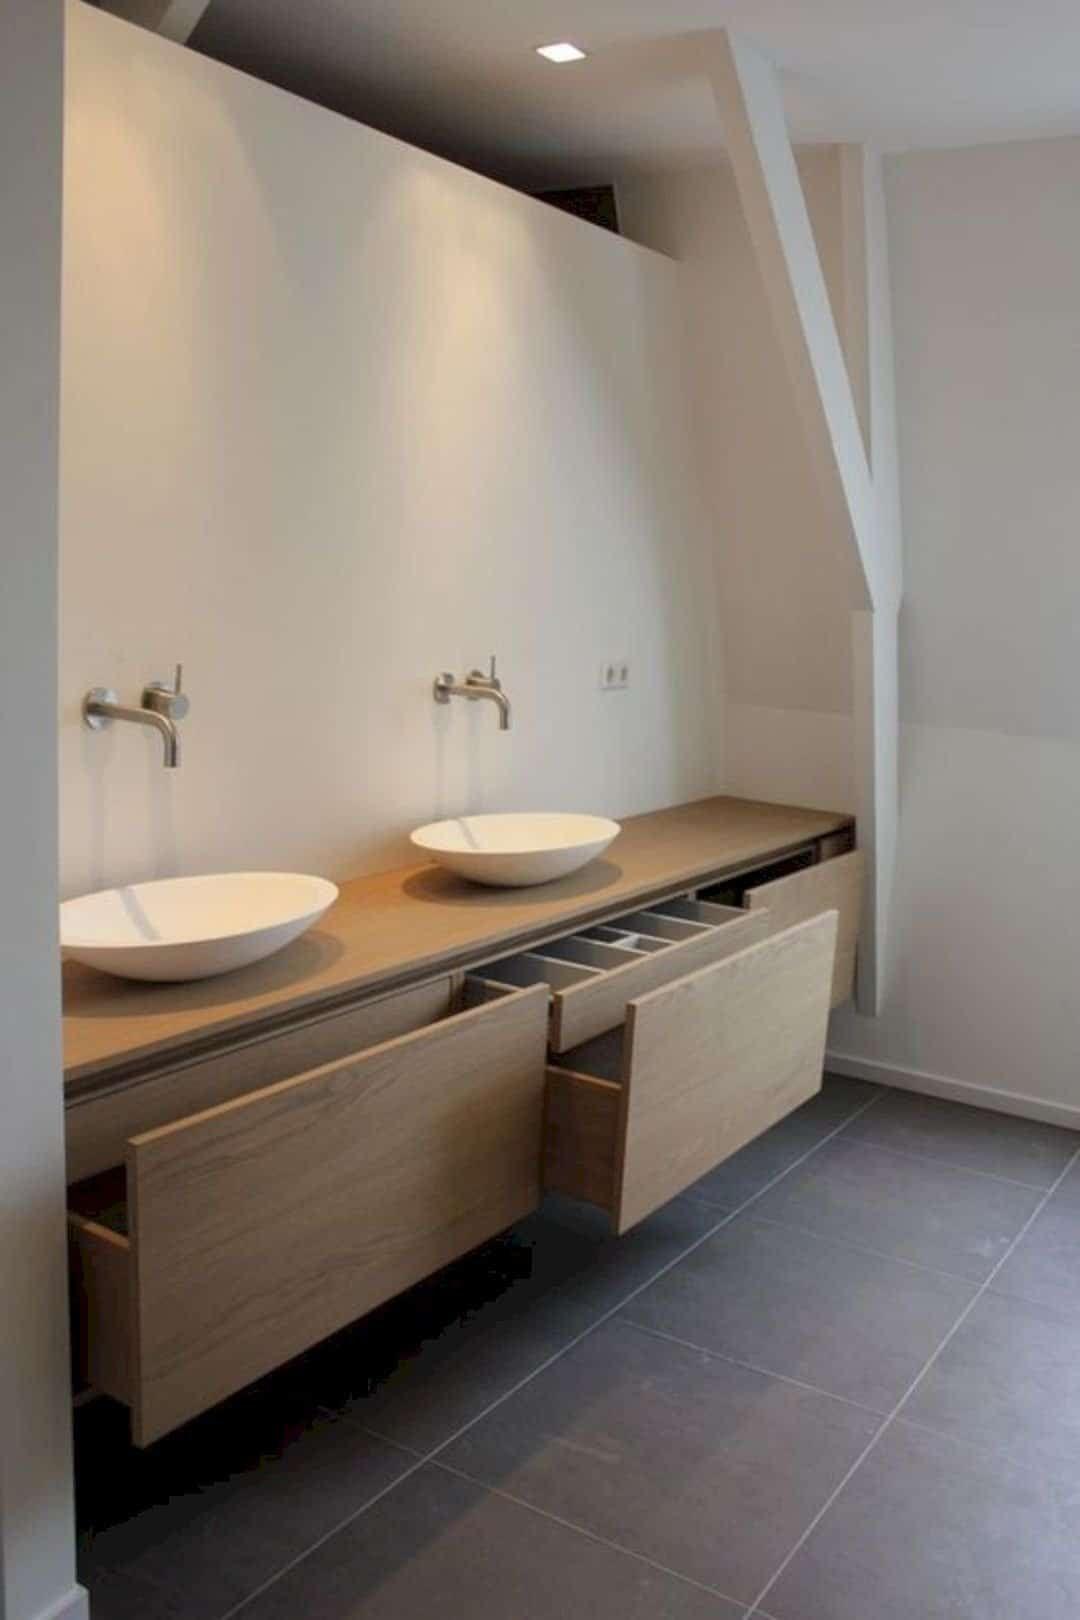 5 Fantastic Bathroom Furniture Ideas Trendy Bathroom Bathroom Layout Bathroom Design Bathroom furniture design ideas